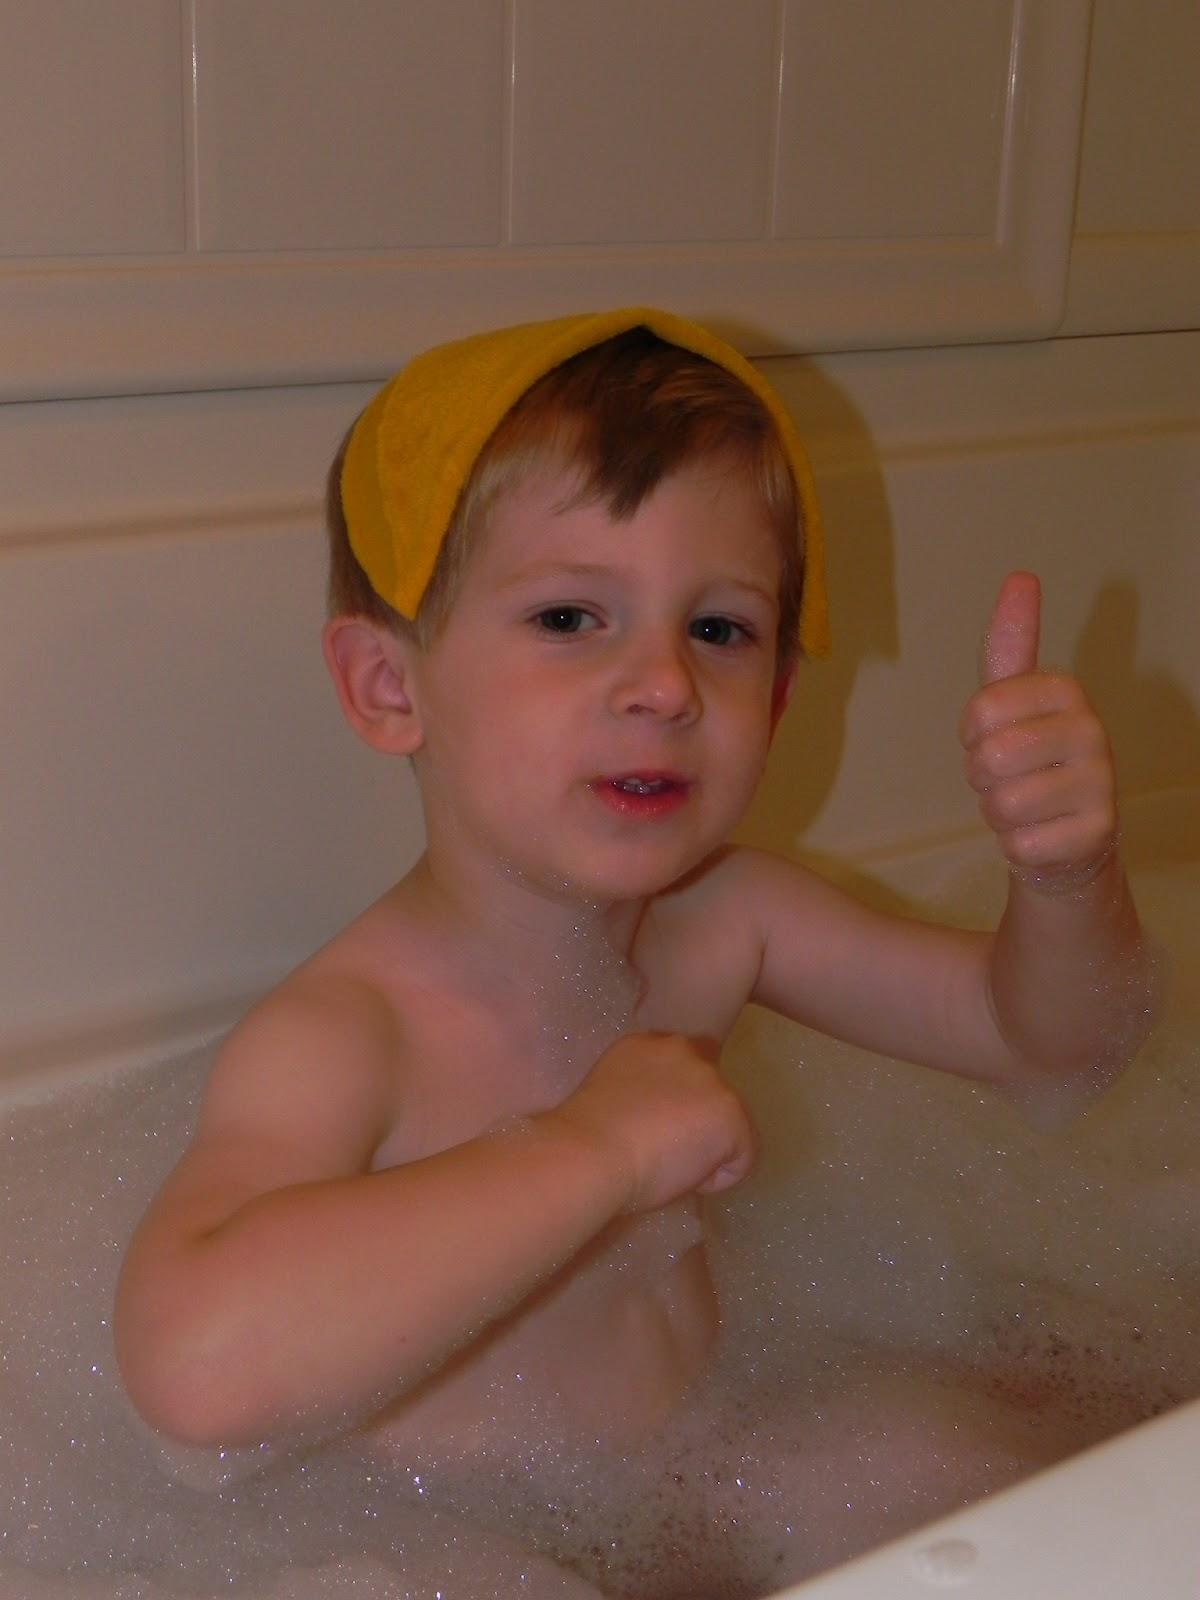 Boys Meet World: Bubble Bath